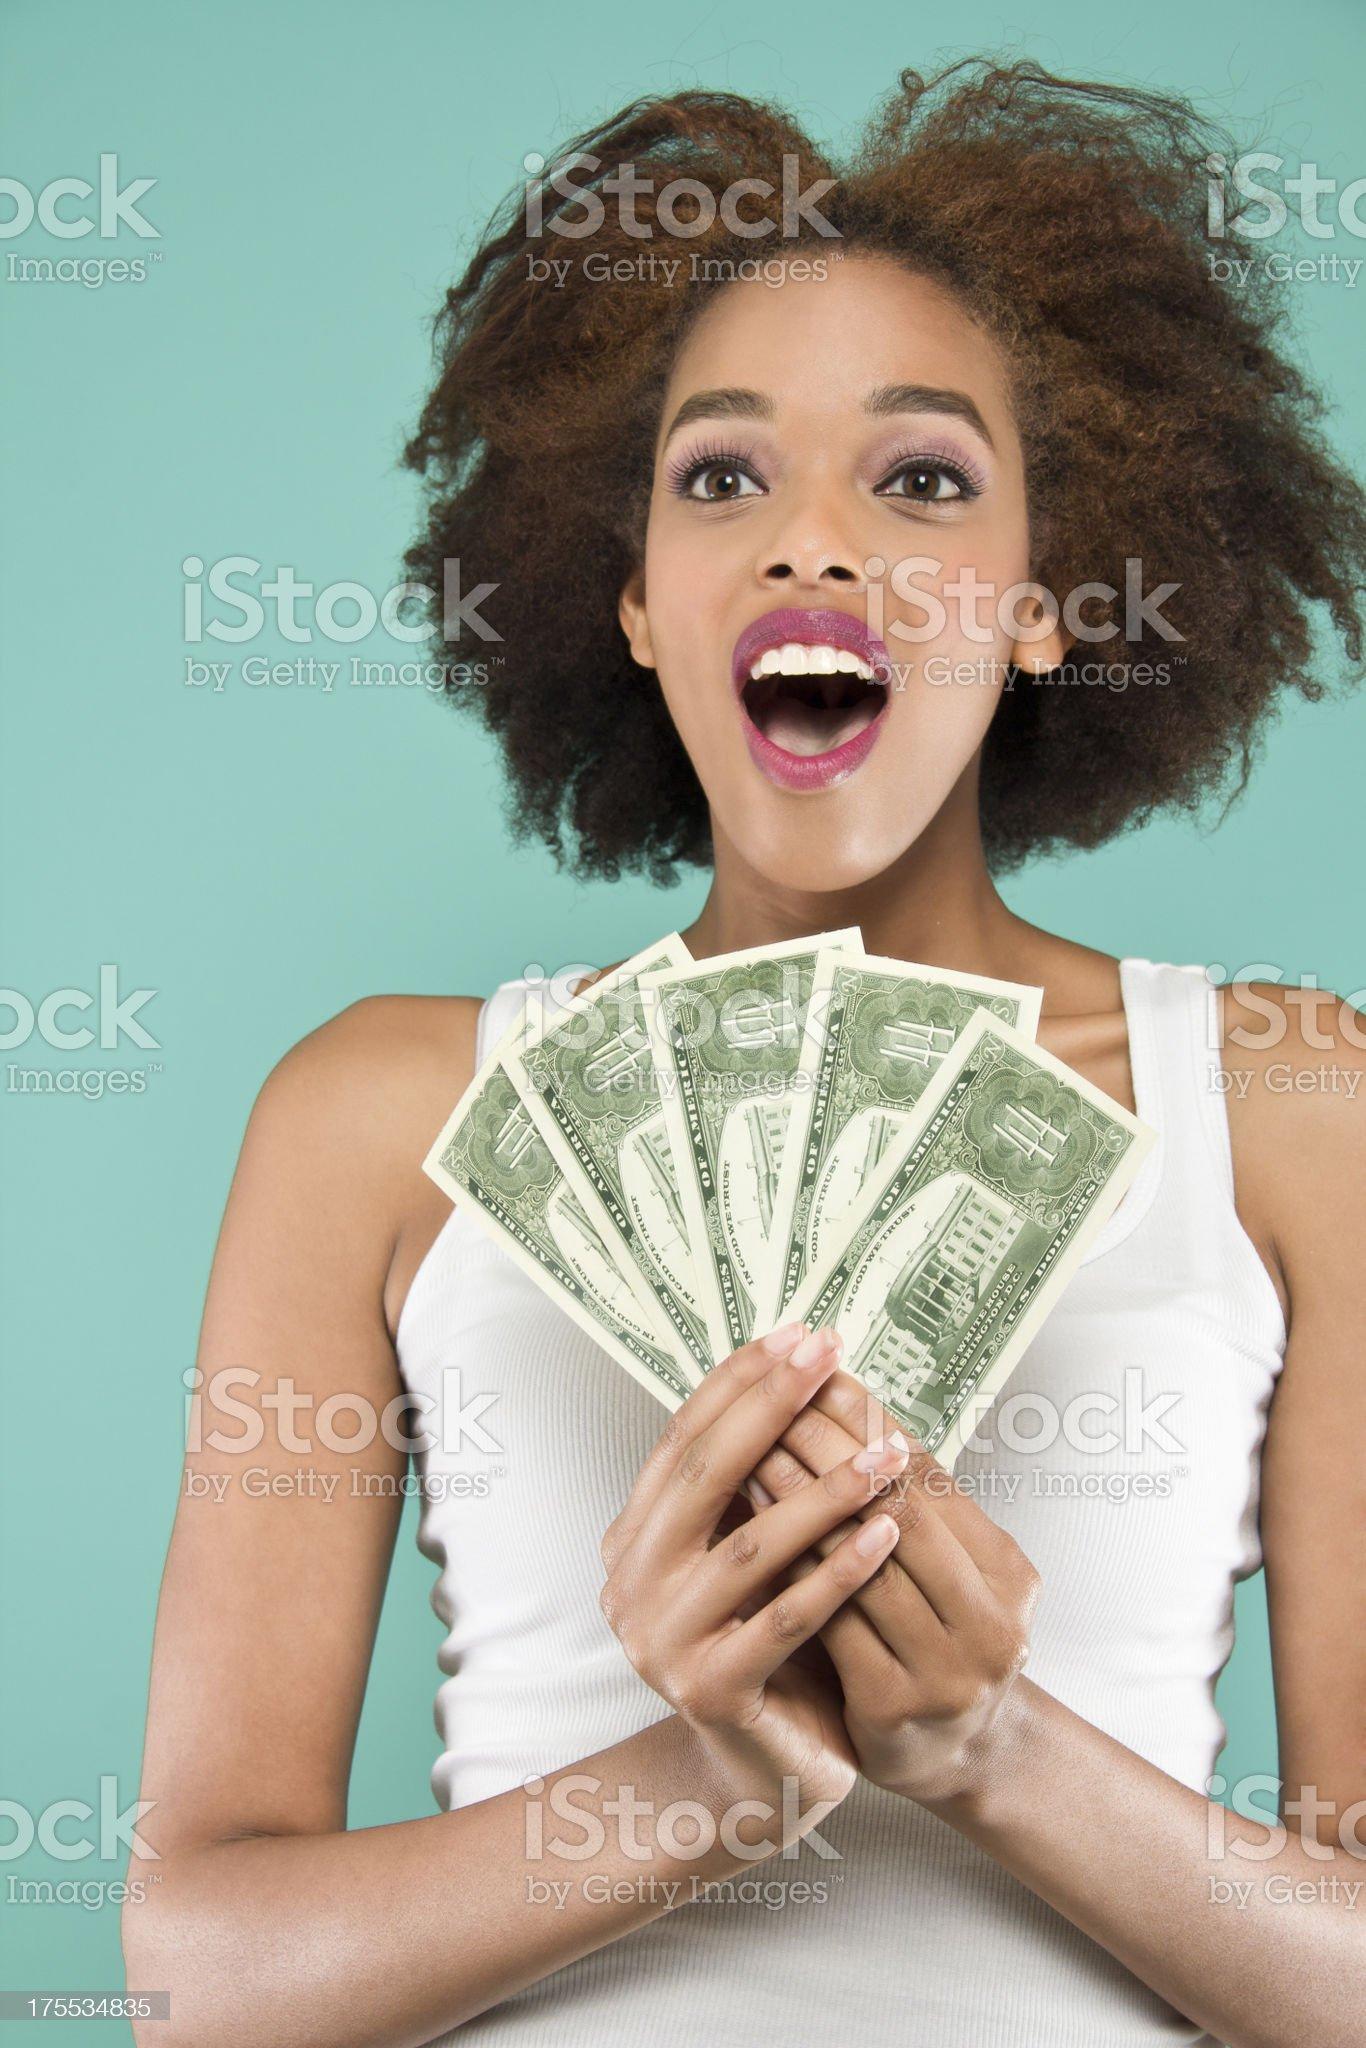 Suprised Holding Money royalty-free stock photo